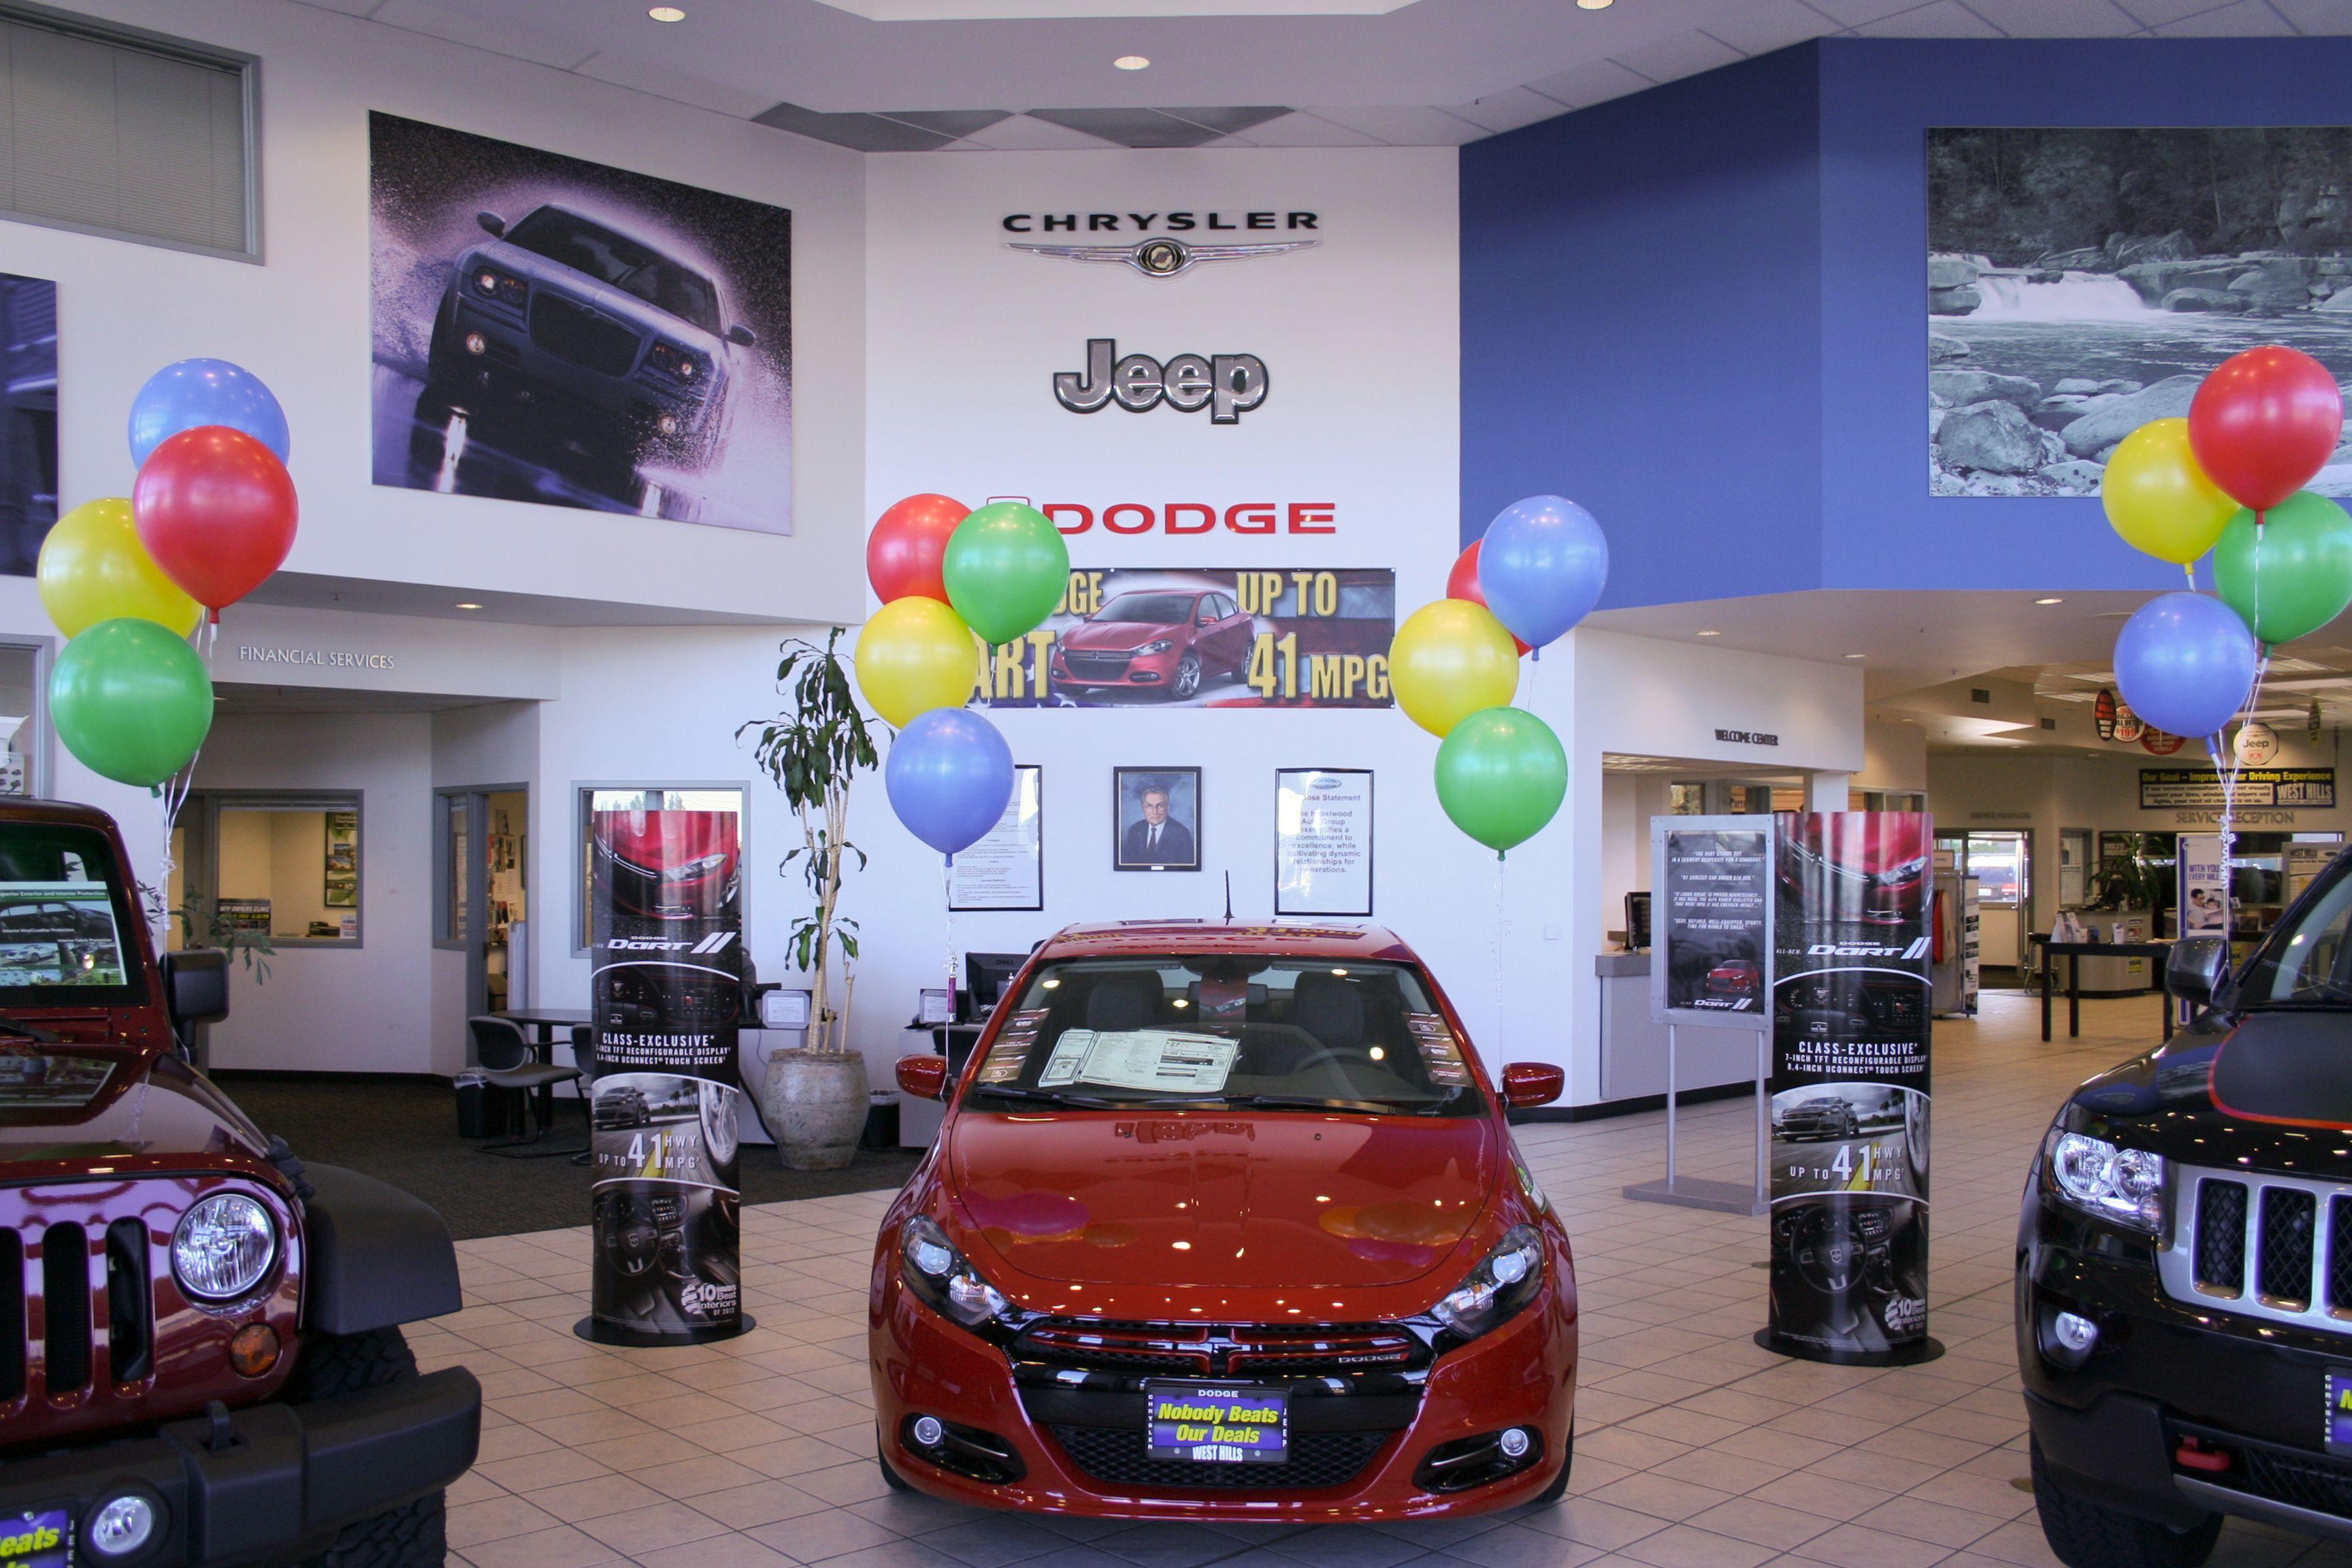 Showroom At West Hills Chrysler, Jeep, Dodge In Bremerton, Wash.